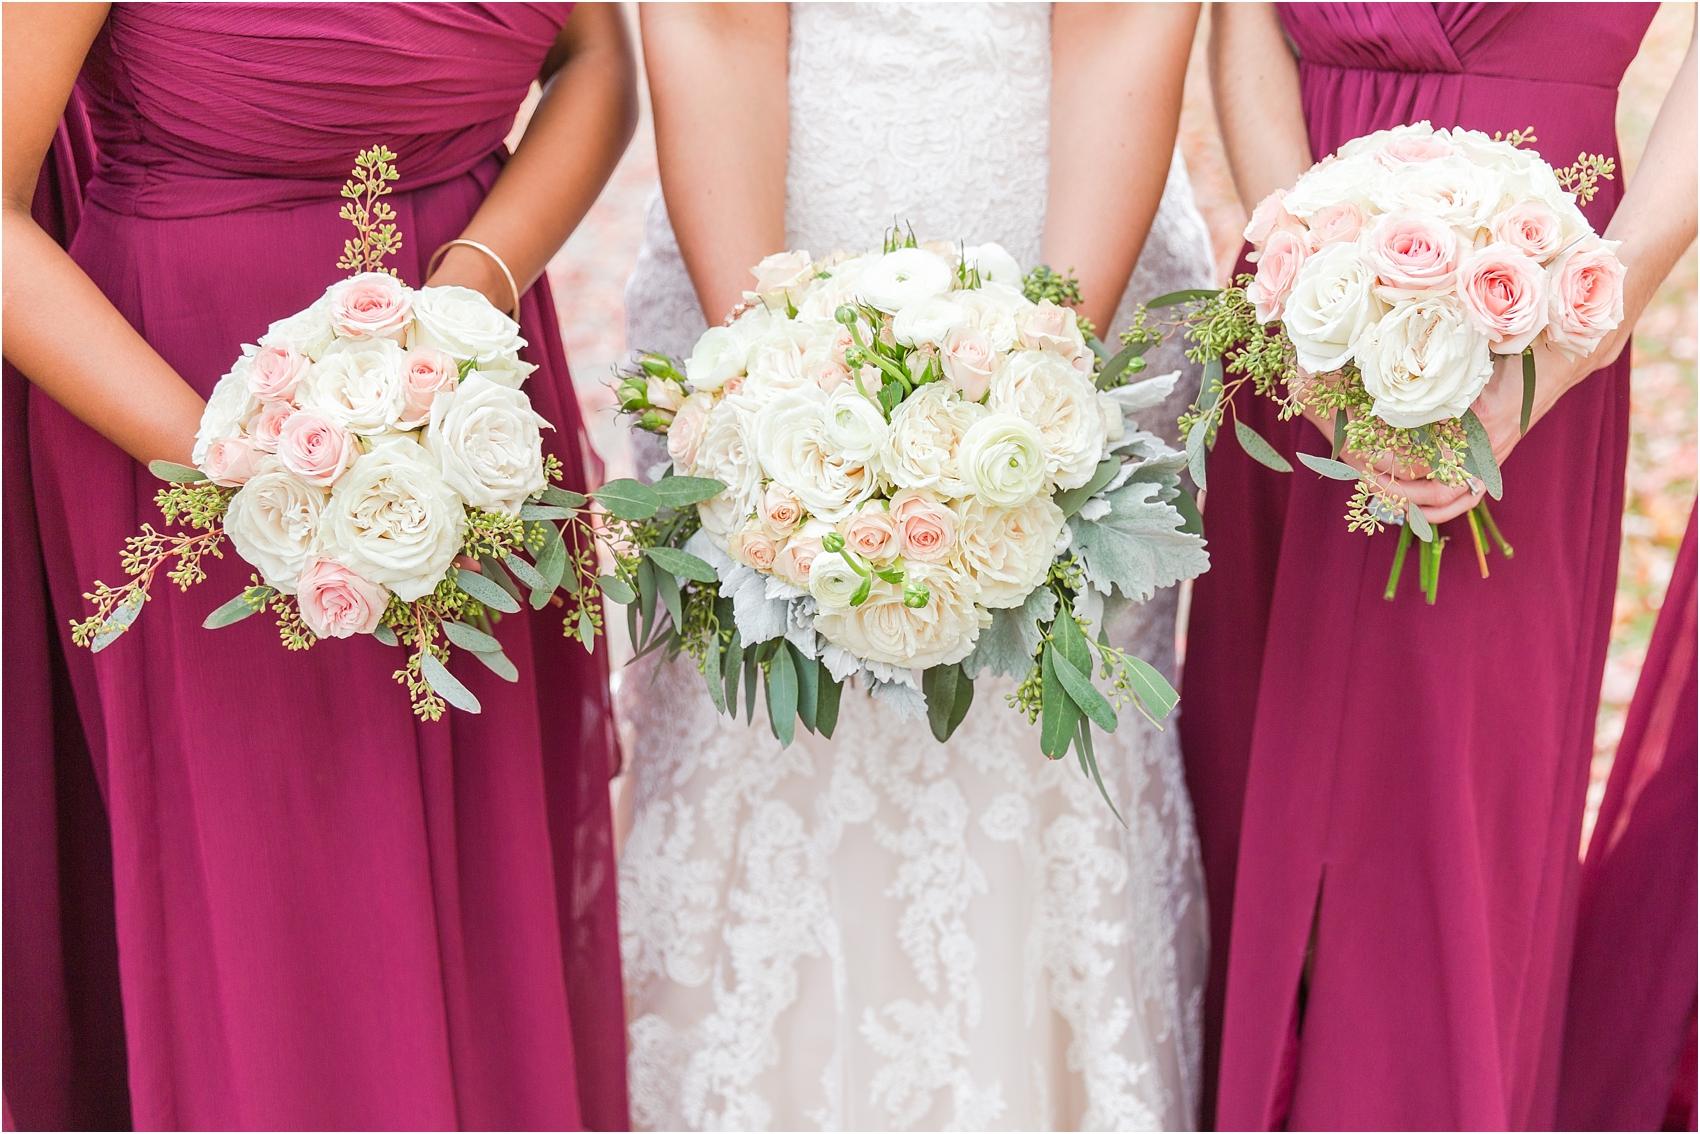 elegant-and-romantic-fall-wedding-photos-at-st-marys-catholic-church-in-monroe-michigan-by-courtney-carolyn-photography_0010.jpg